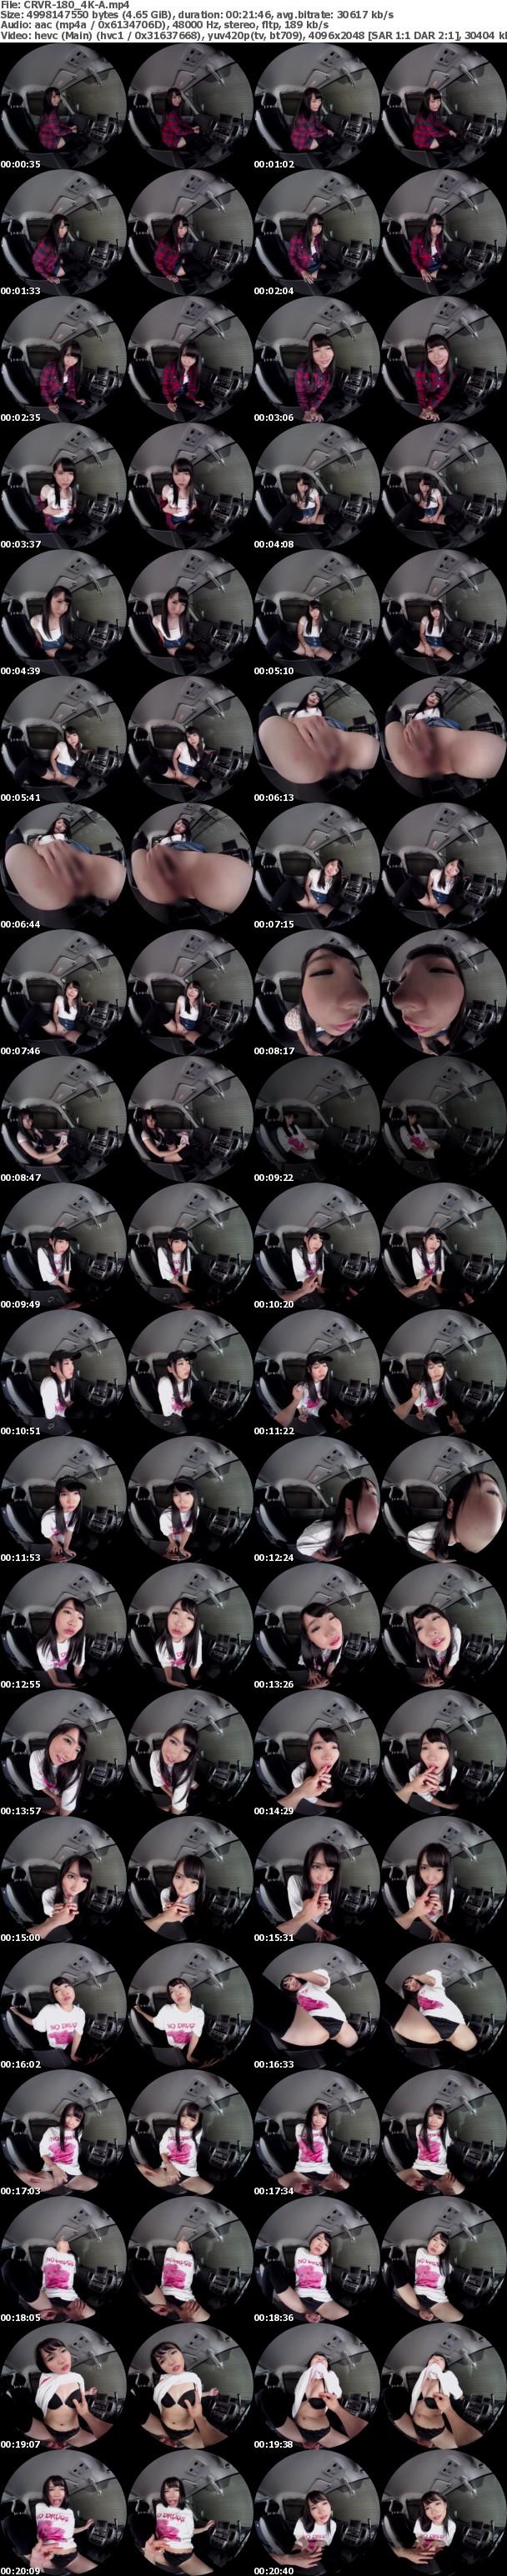 (VR) (4K) CRVR-180 枢木あおい カーセックスVR「ここでセックス…しよや」黒髪かわいい敏感ボディのえちえちなバイトと強●車中不倫!